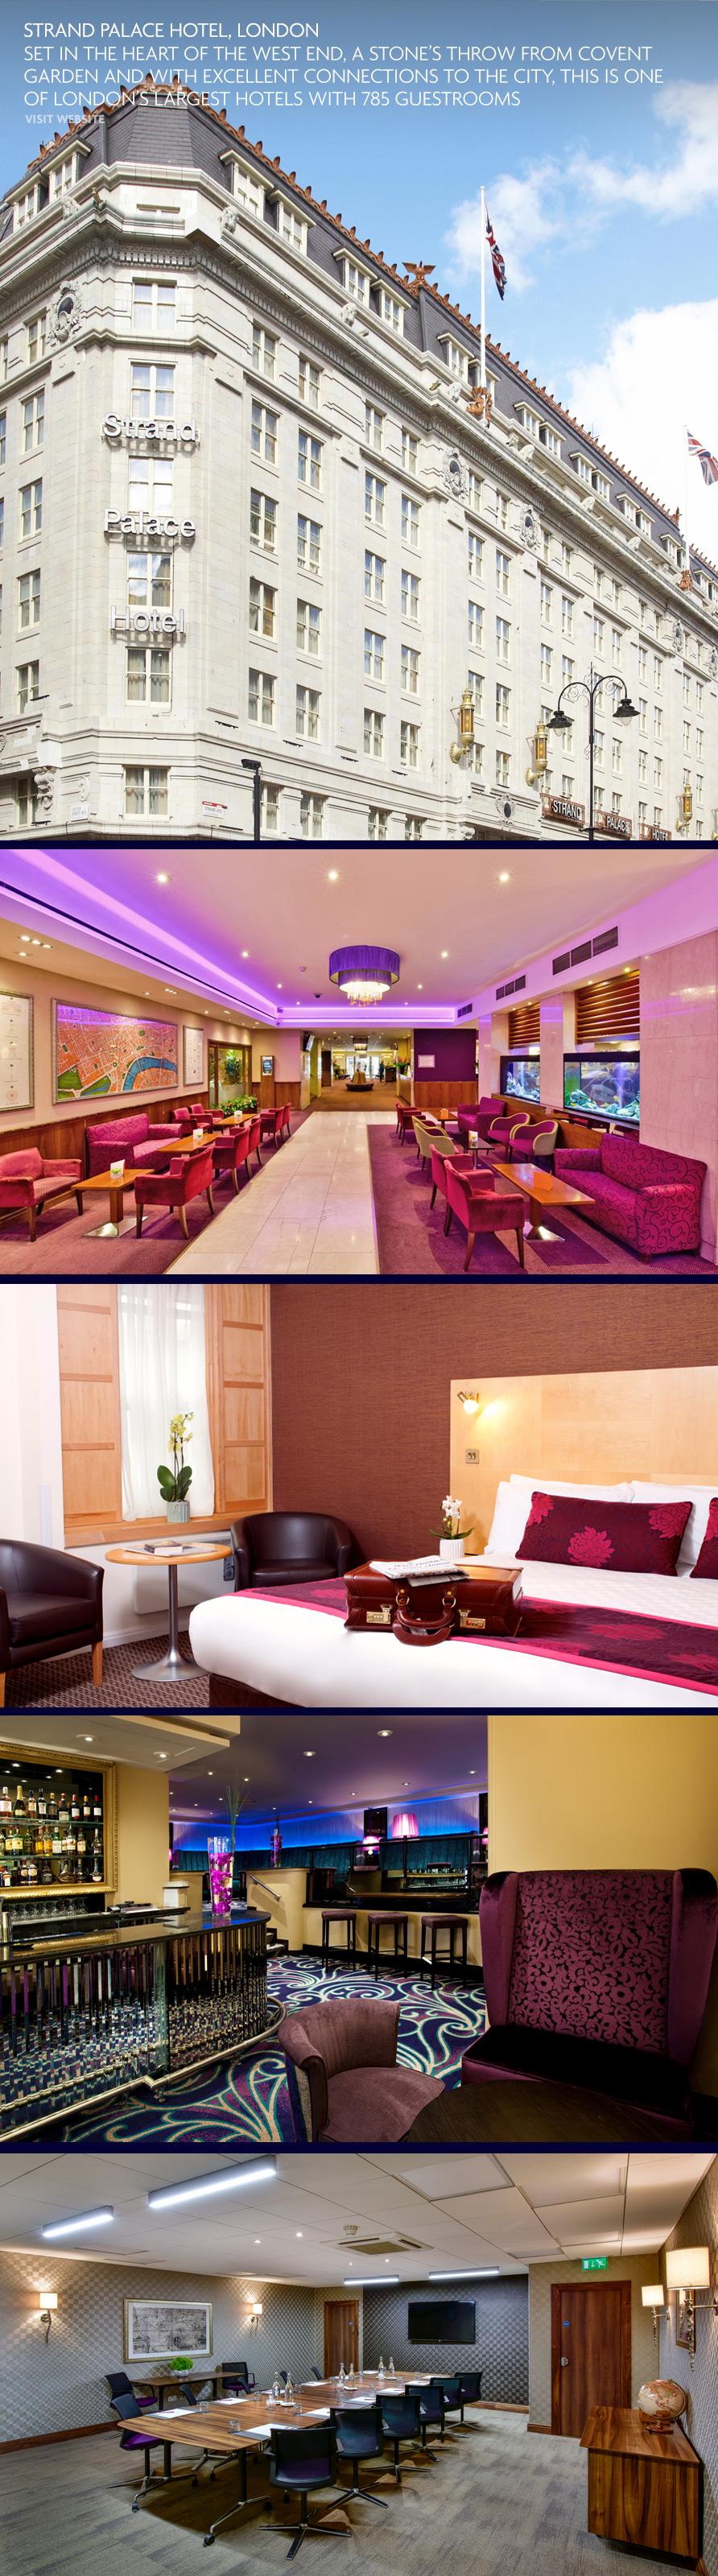 strand-palace-hotel